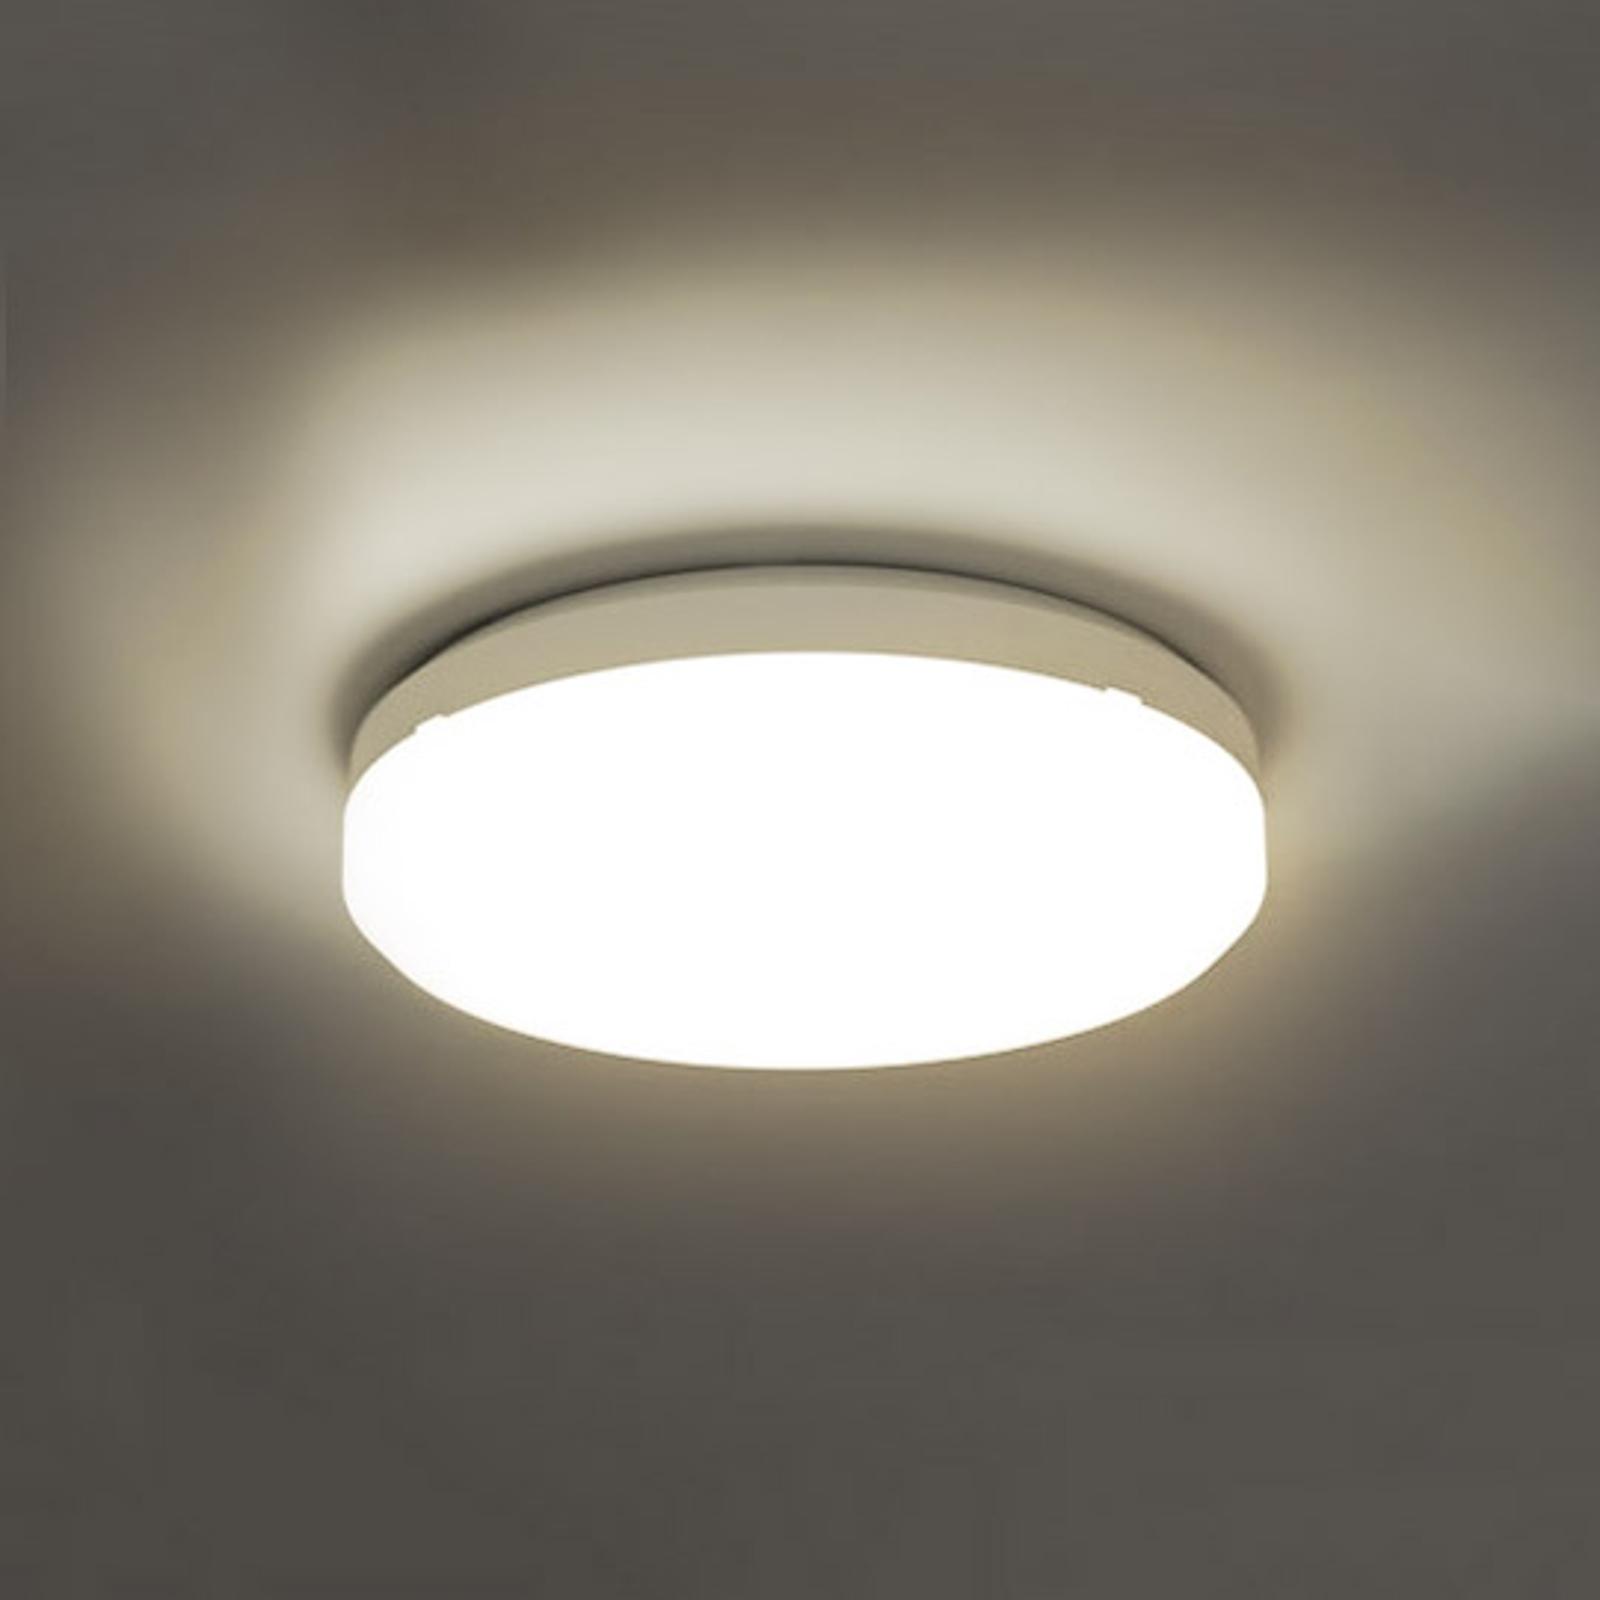 Sun 15 lampa sufitowa LED IP65 26 W 3000K